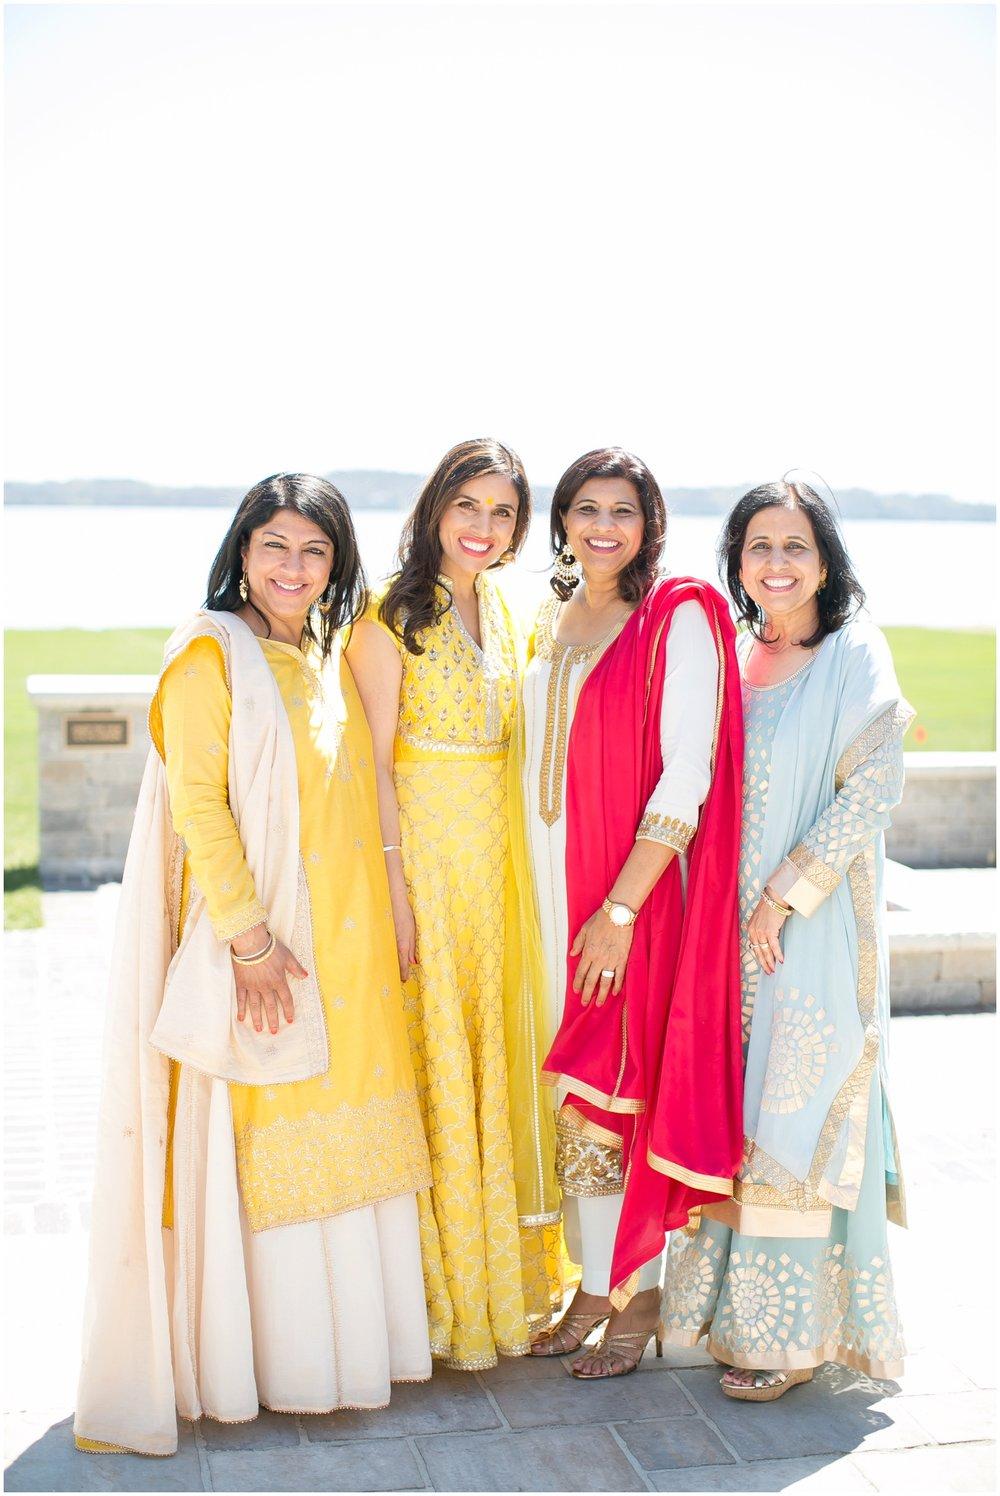 Bishops_Bay_Traditional_Indian_Tea_Ceremony_Madison_Wi_2855.jpg